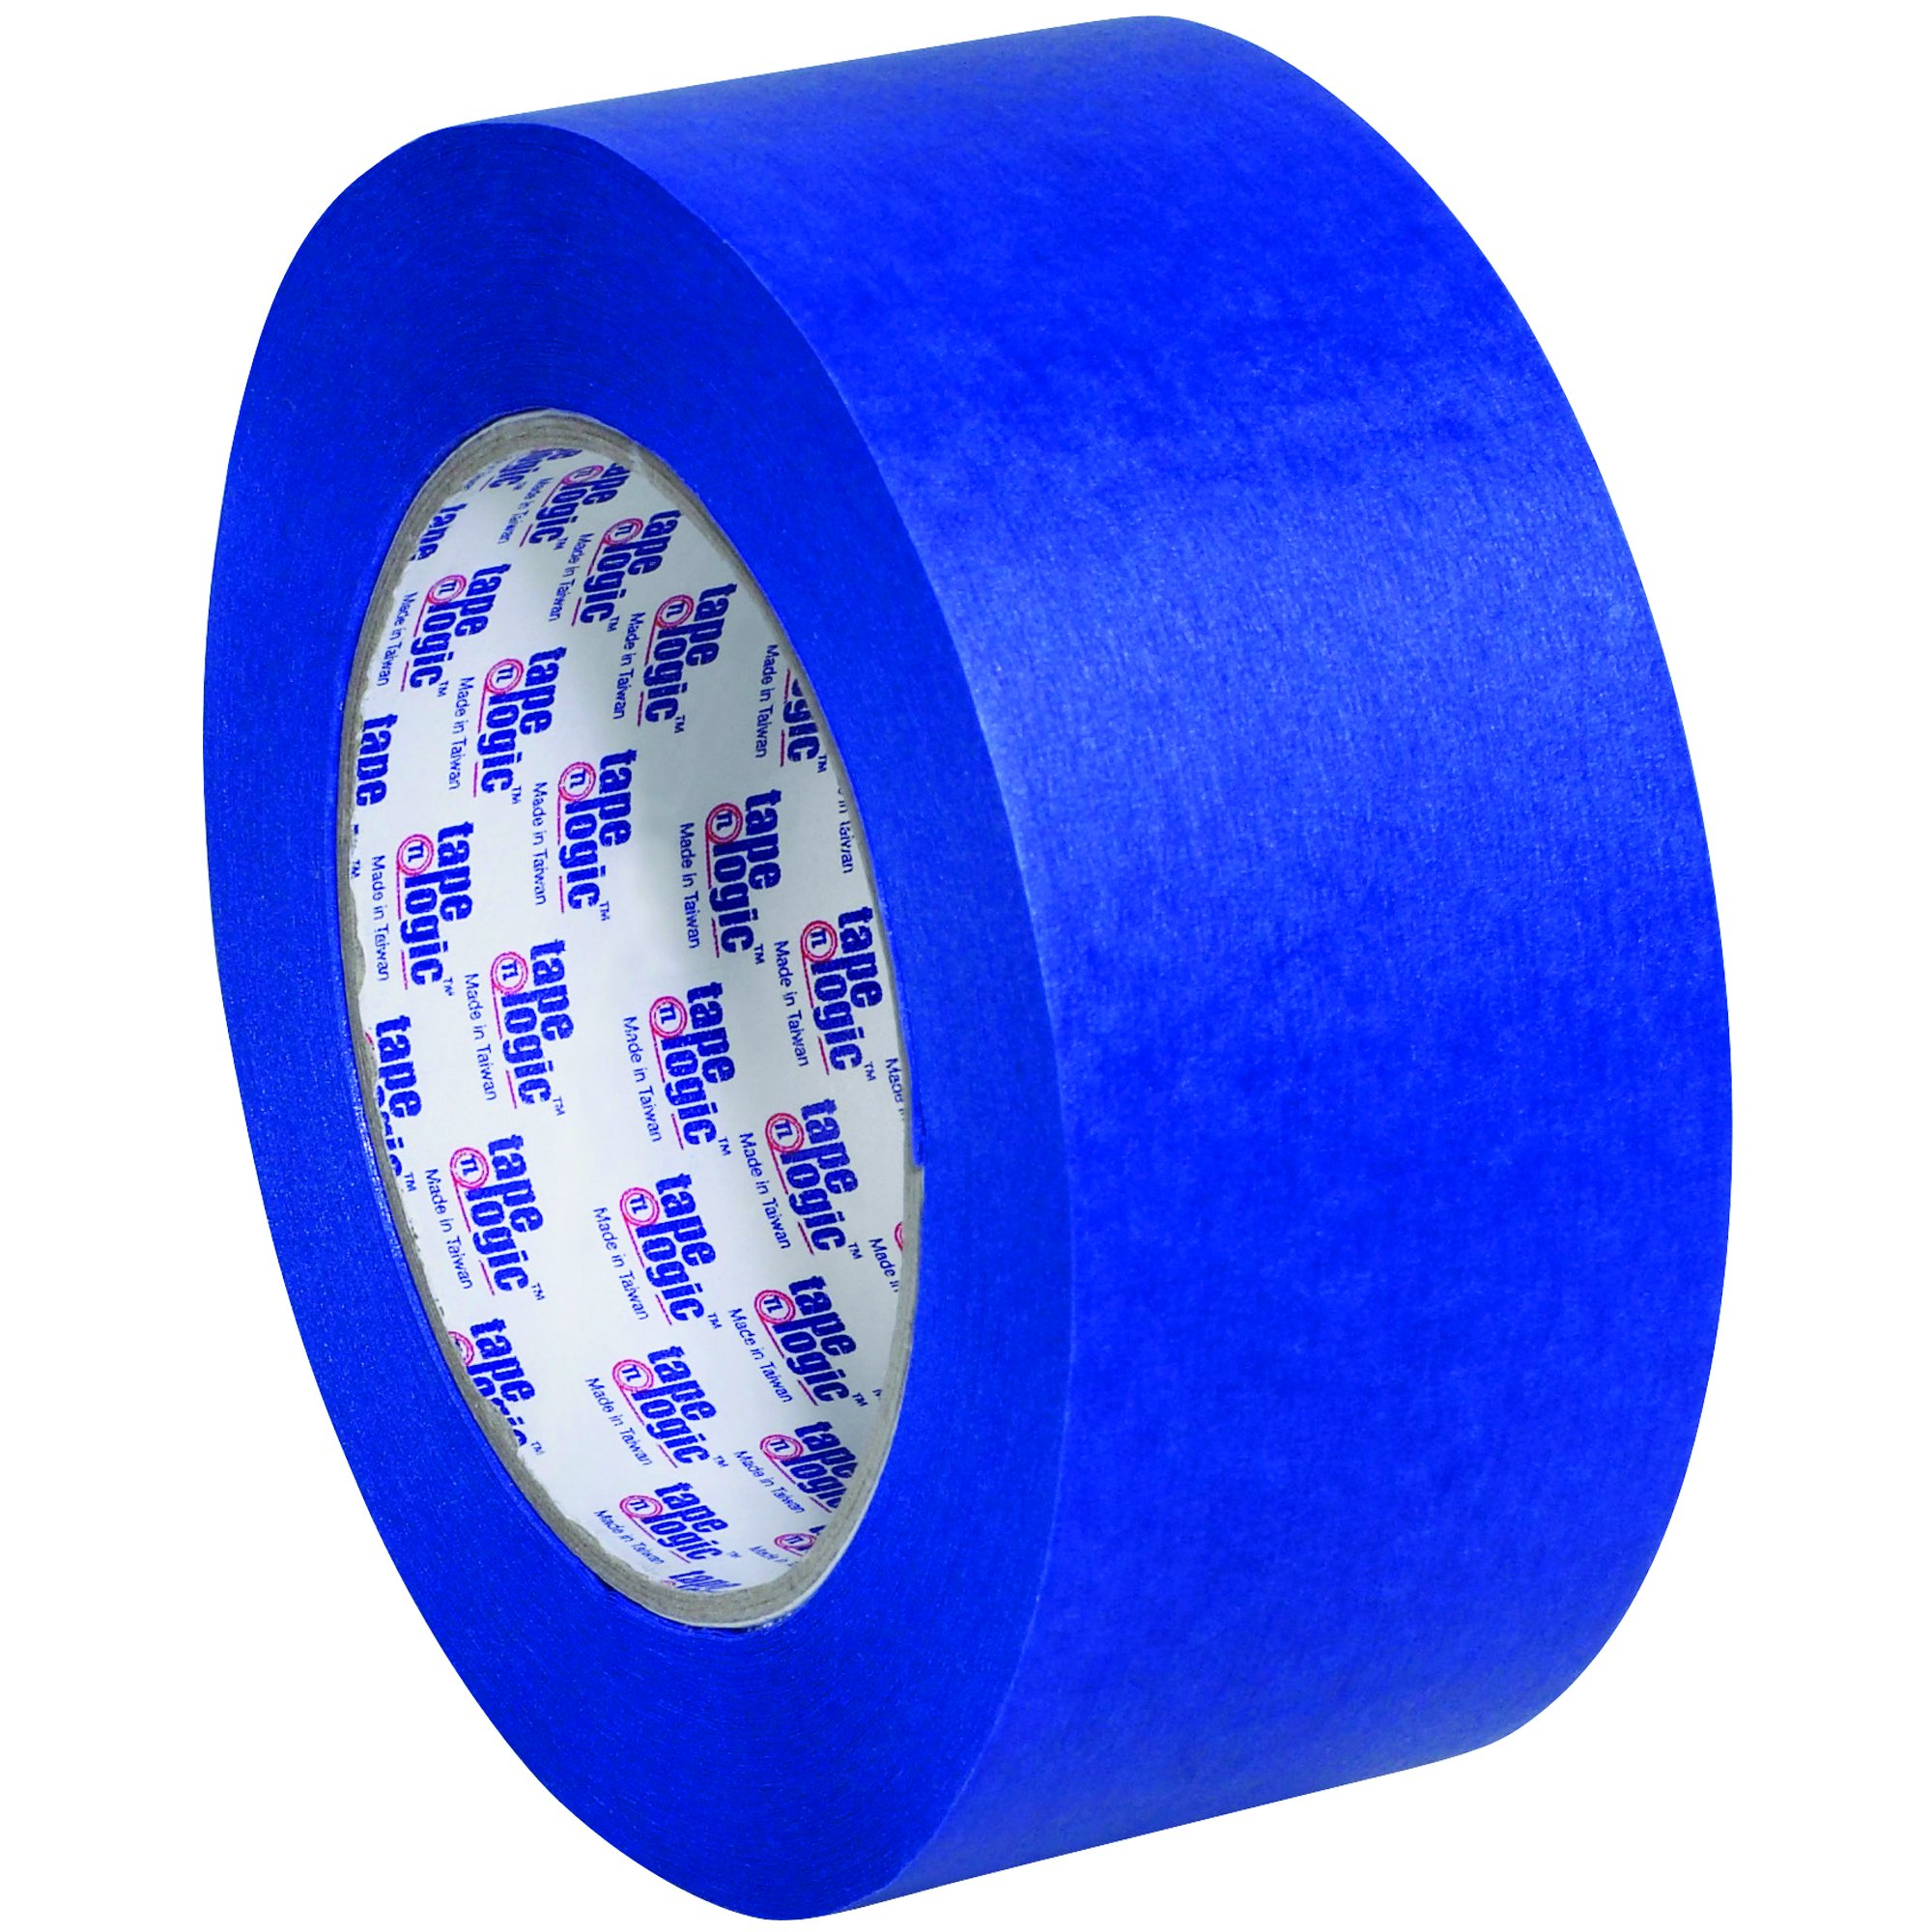 BOX USA BT937300012PK Tape Logic 3000 Painter's Masking Tape, 2'' x 60 yd., Blue (Pack of 12)